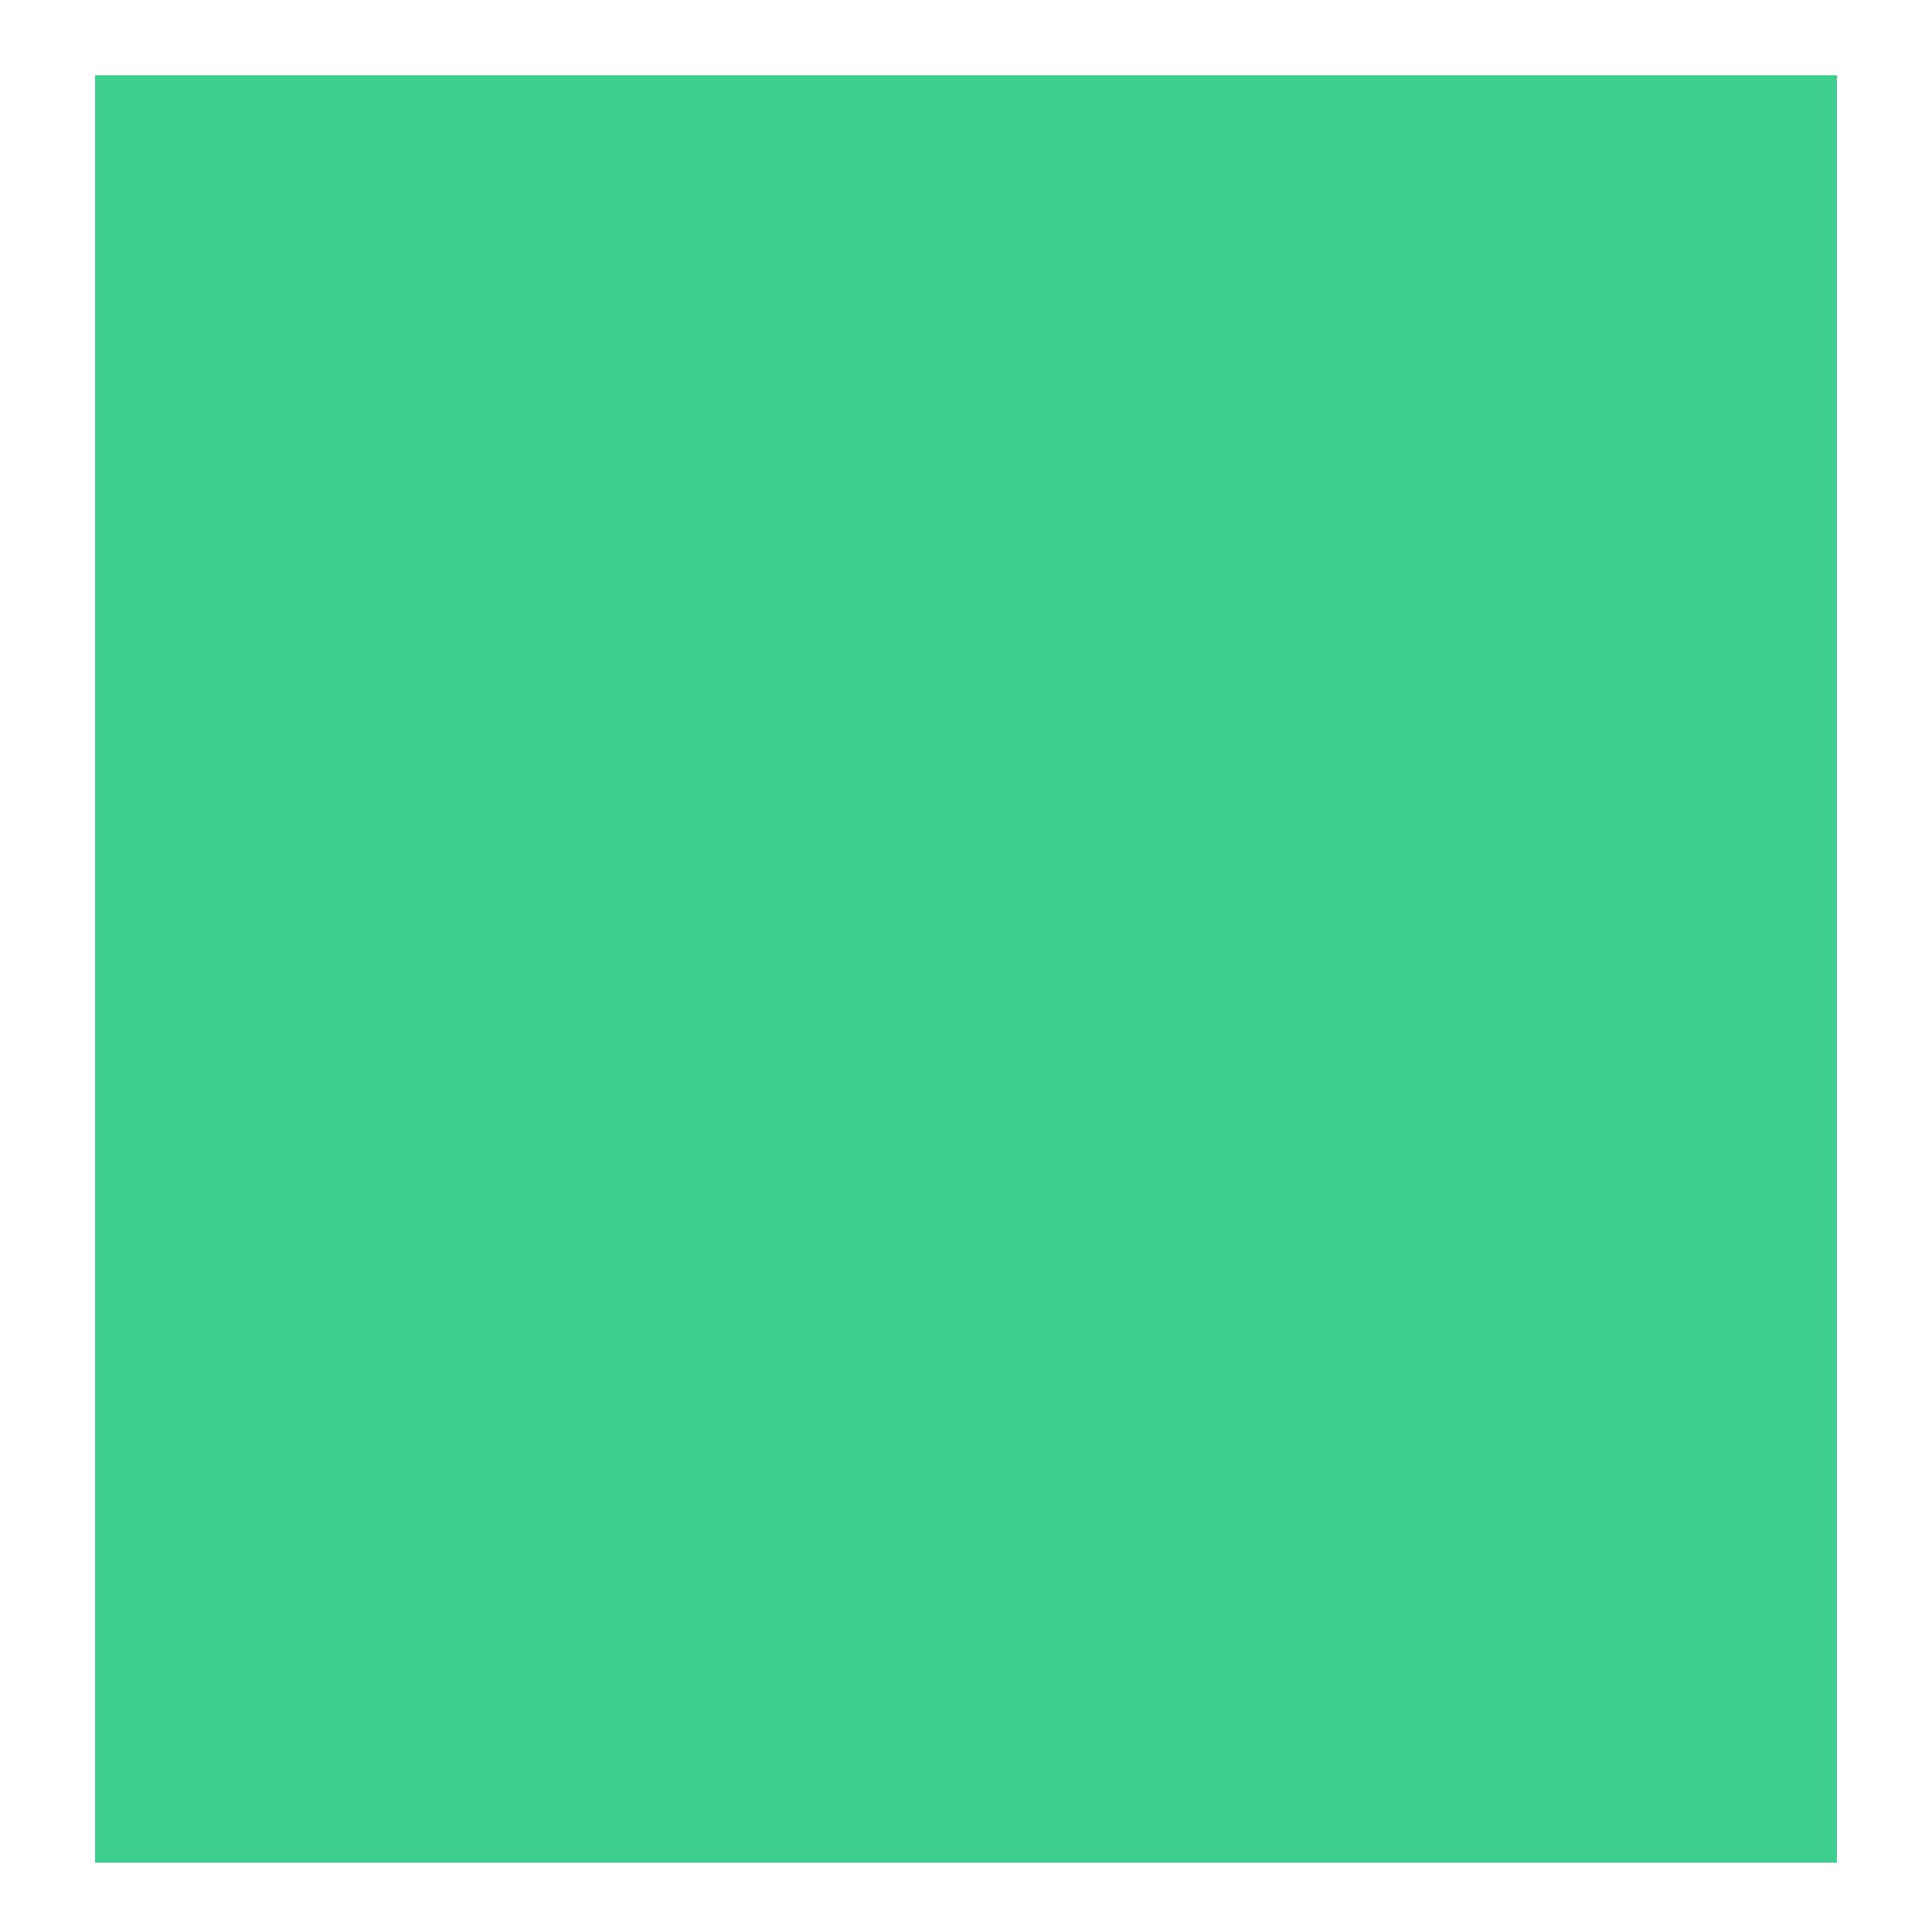 green gear at Logicopy